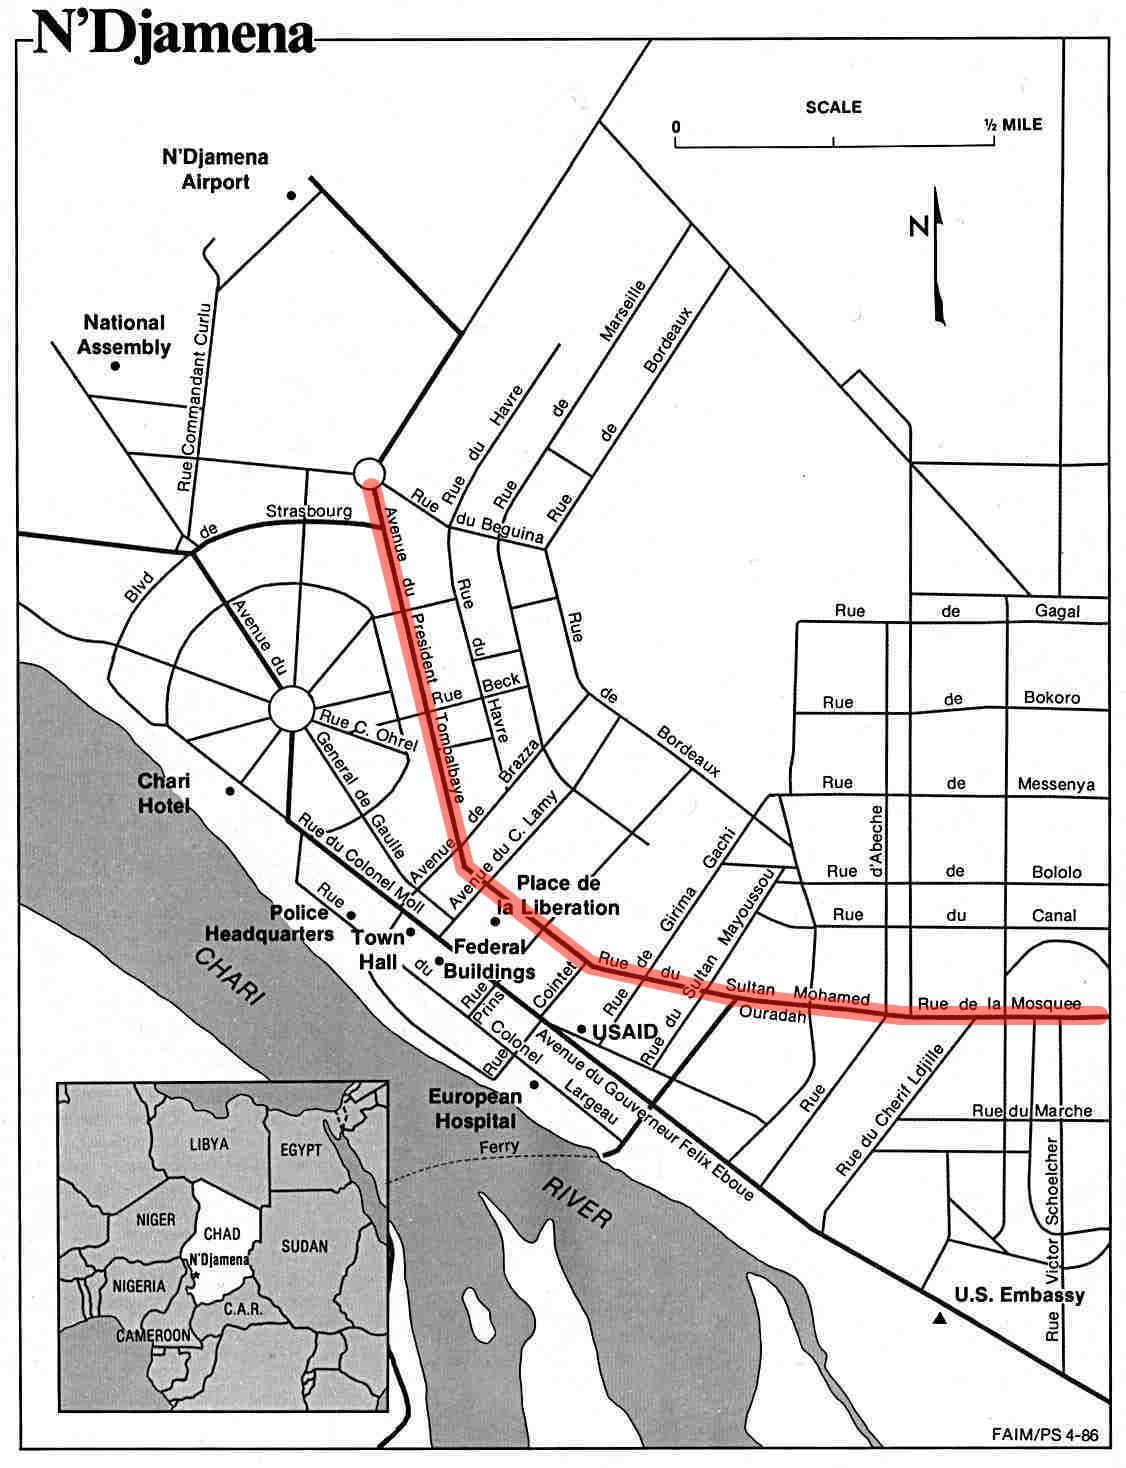 File:Charles de Gaulle Avenue N'djamena.JPG - Wikimedia Commons N'Djamena Map